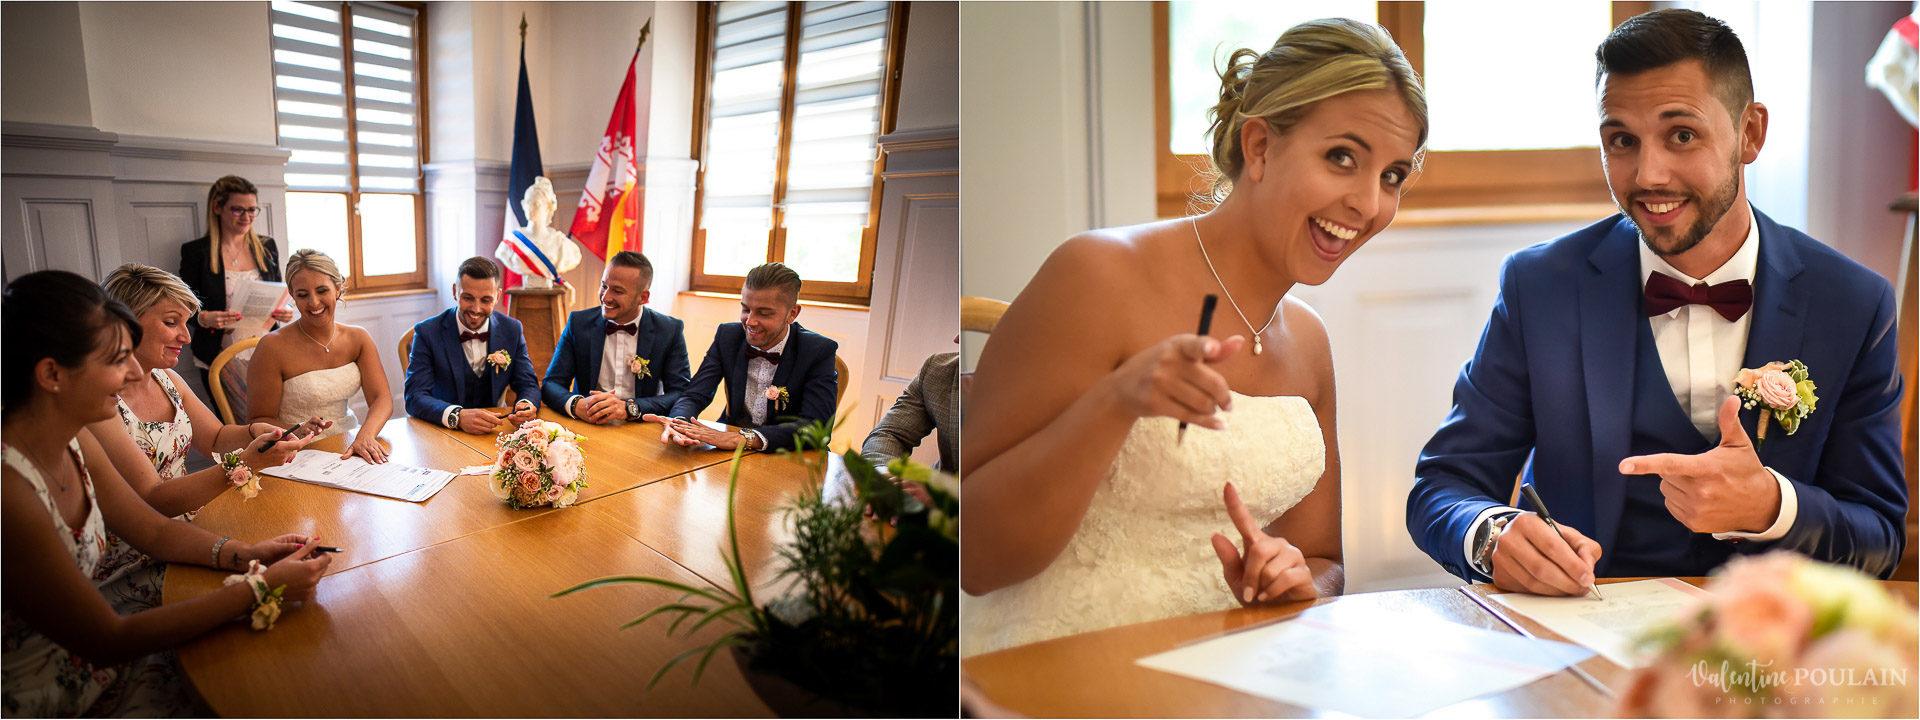 Mariage fun Petit Wettolsheim - Valentine Poulain oh yeah